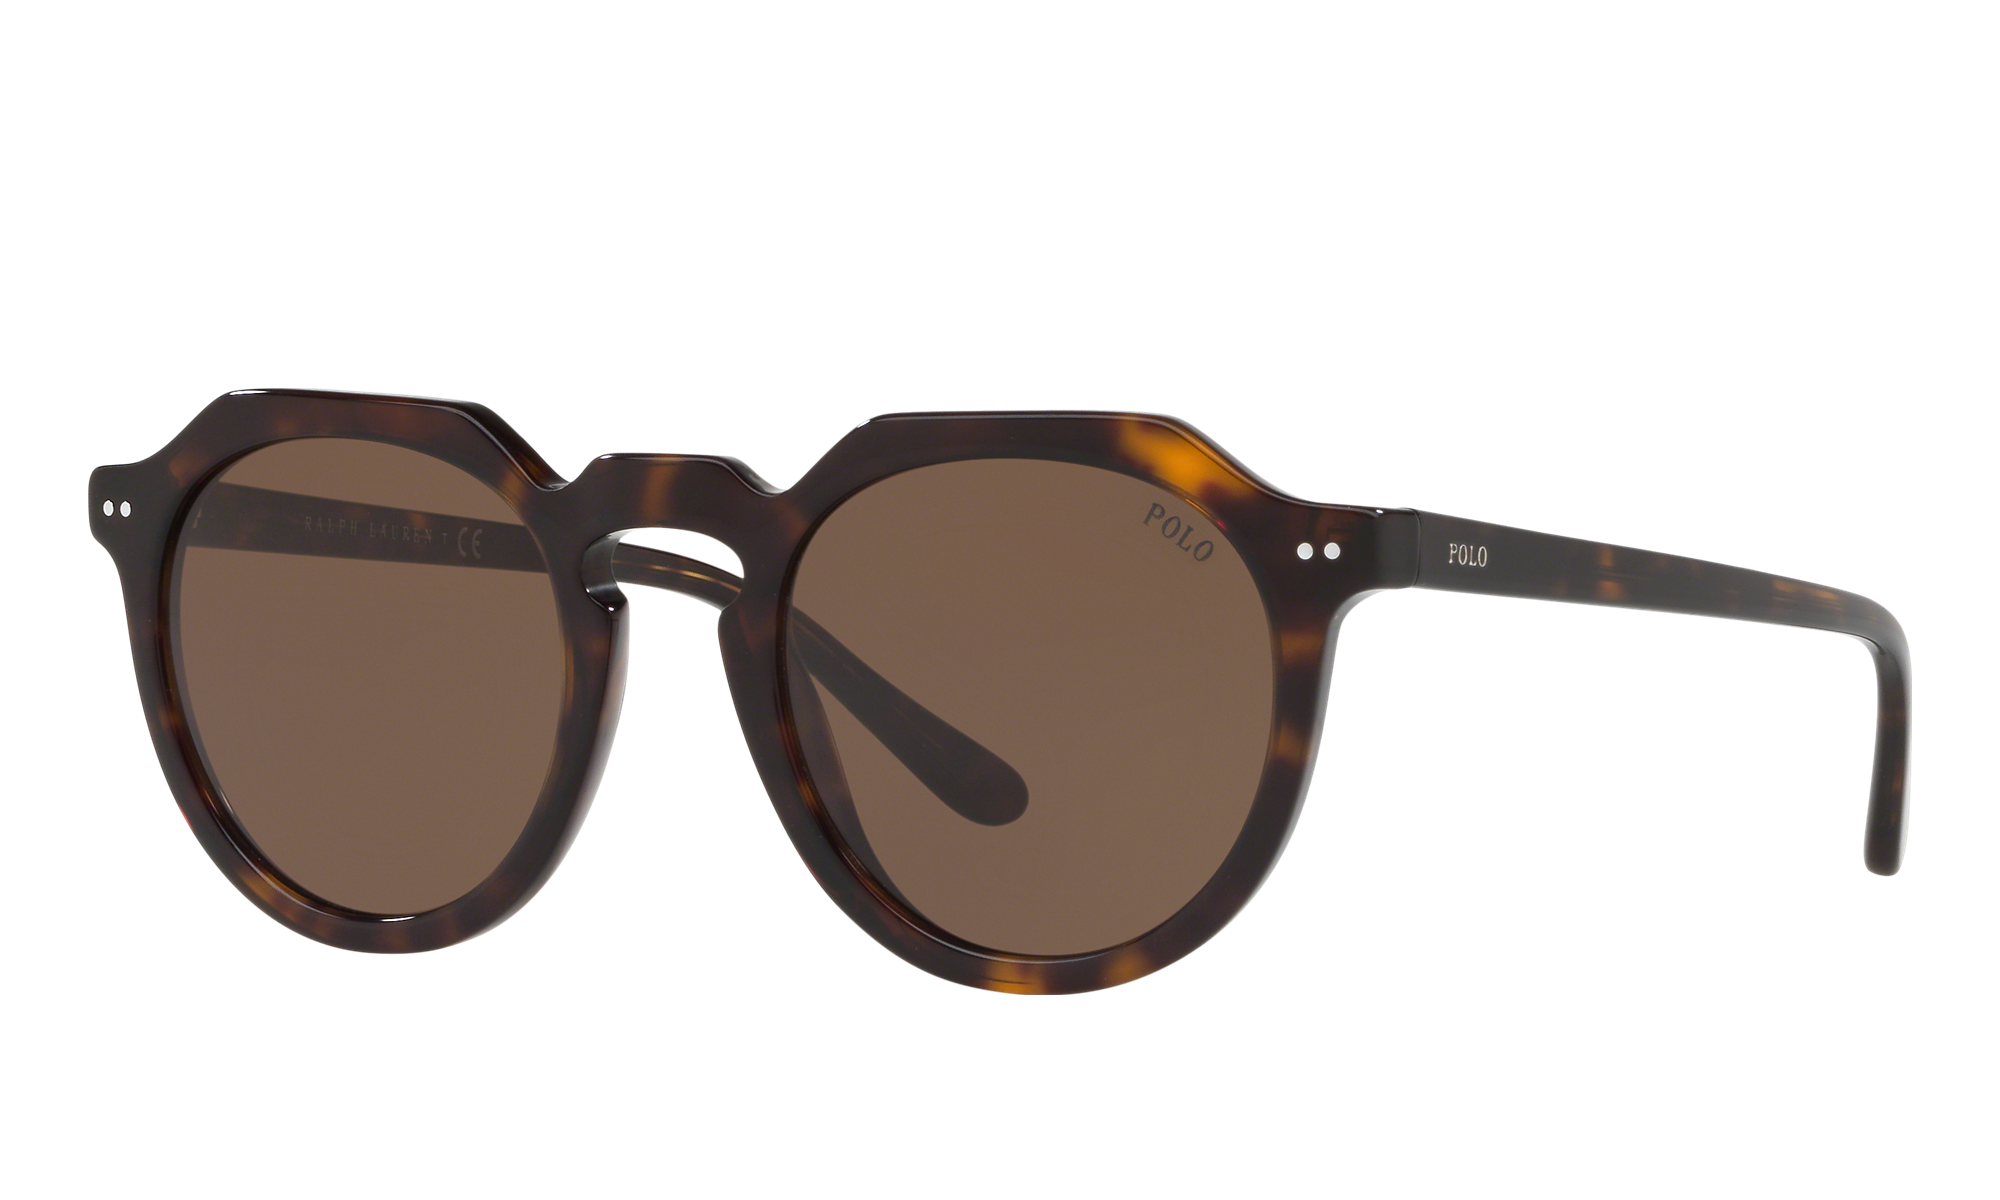 1930s Glasses and Sunglasses History Polo Ralph Lauren Unisex Ph4138 Tortoise Size Standard $79.00 AT vintagedancer.com